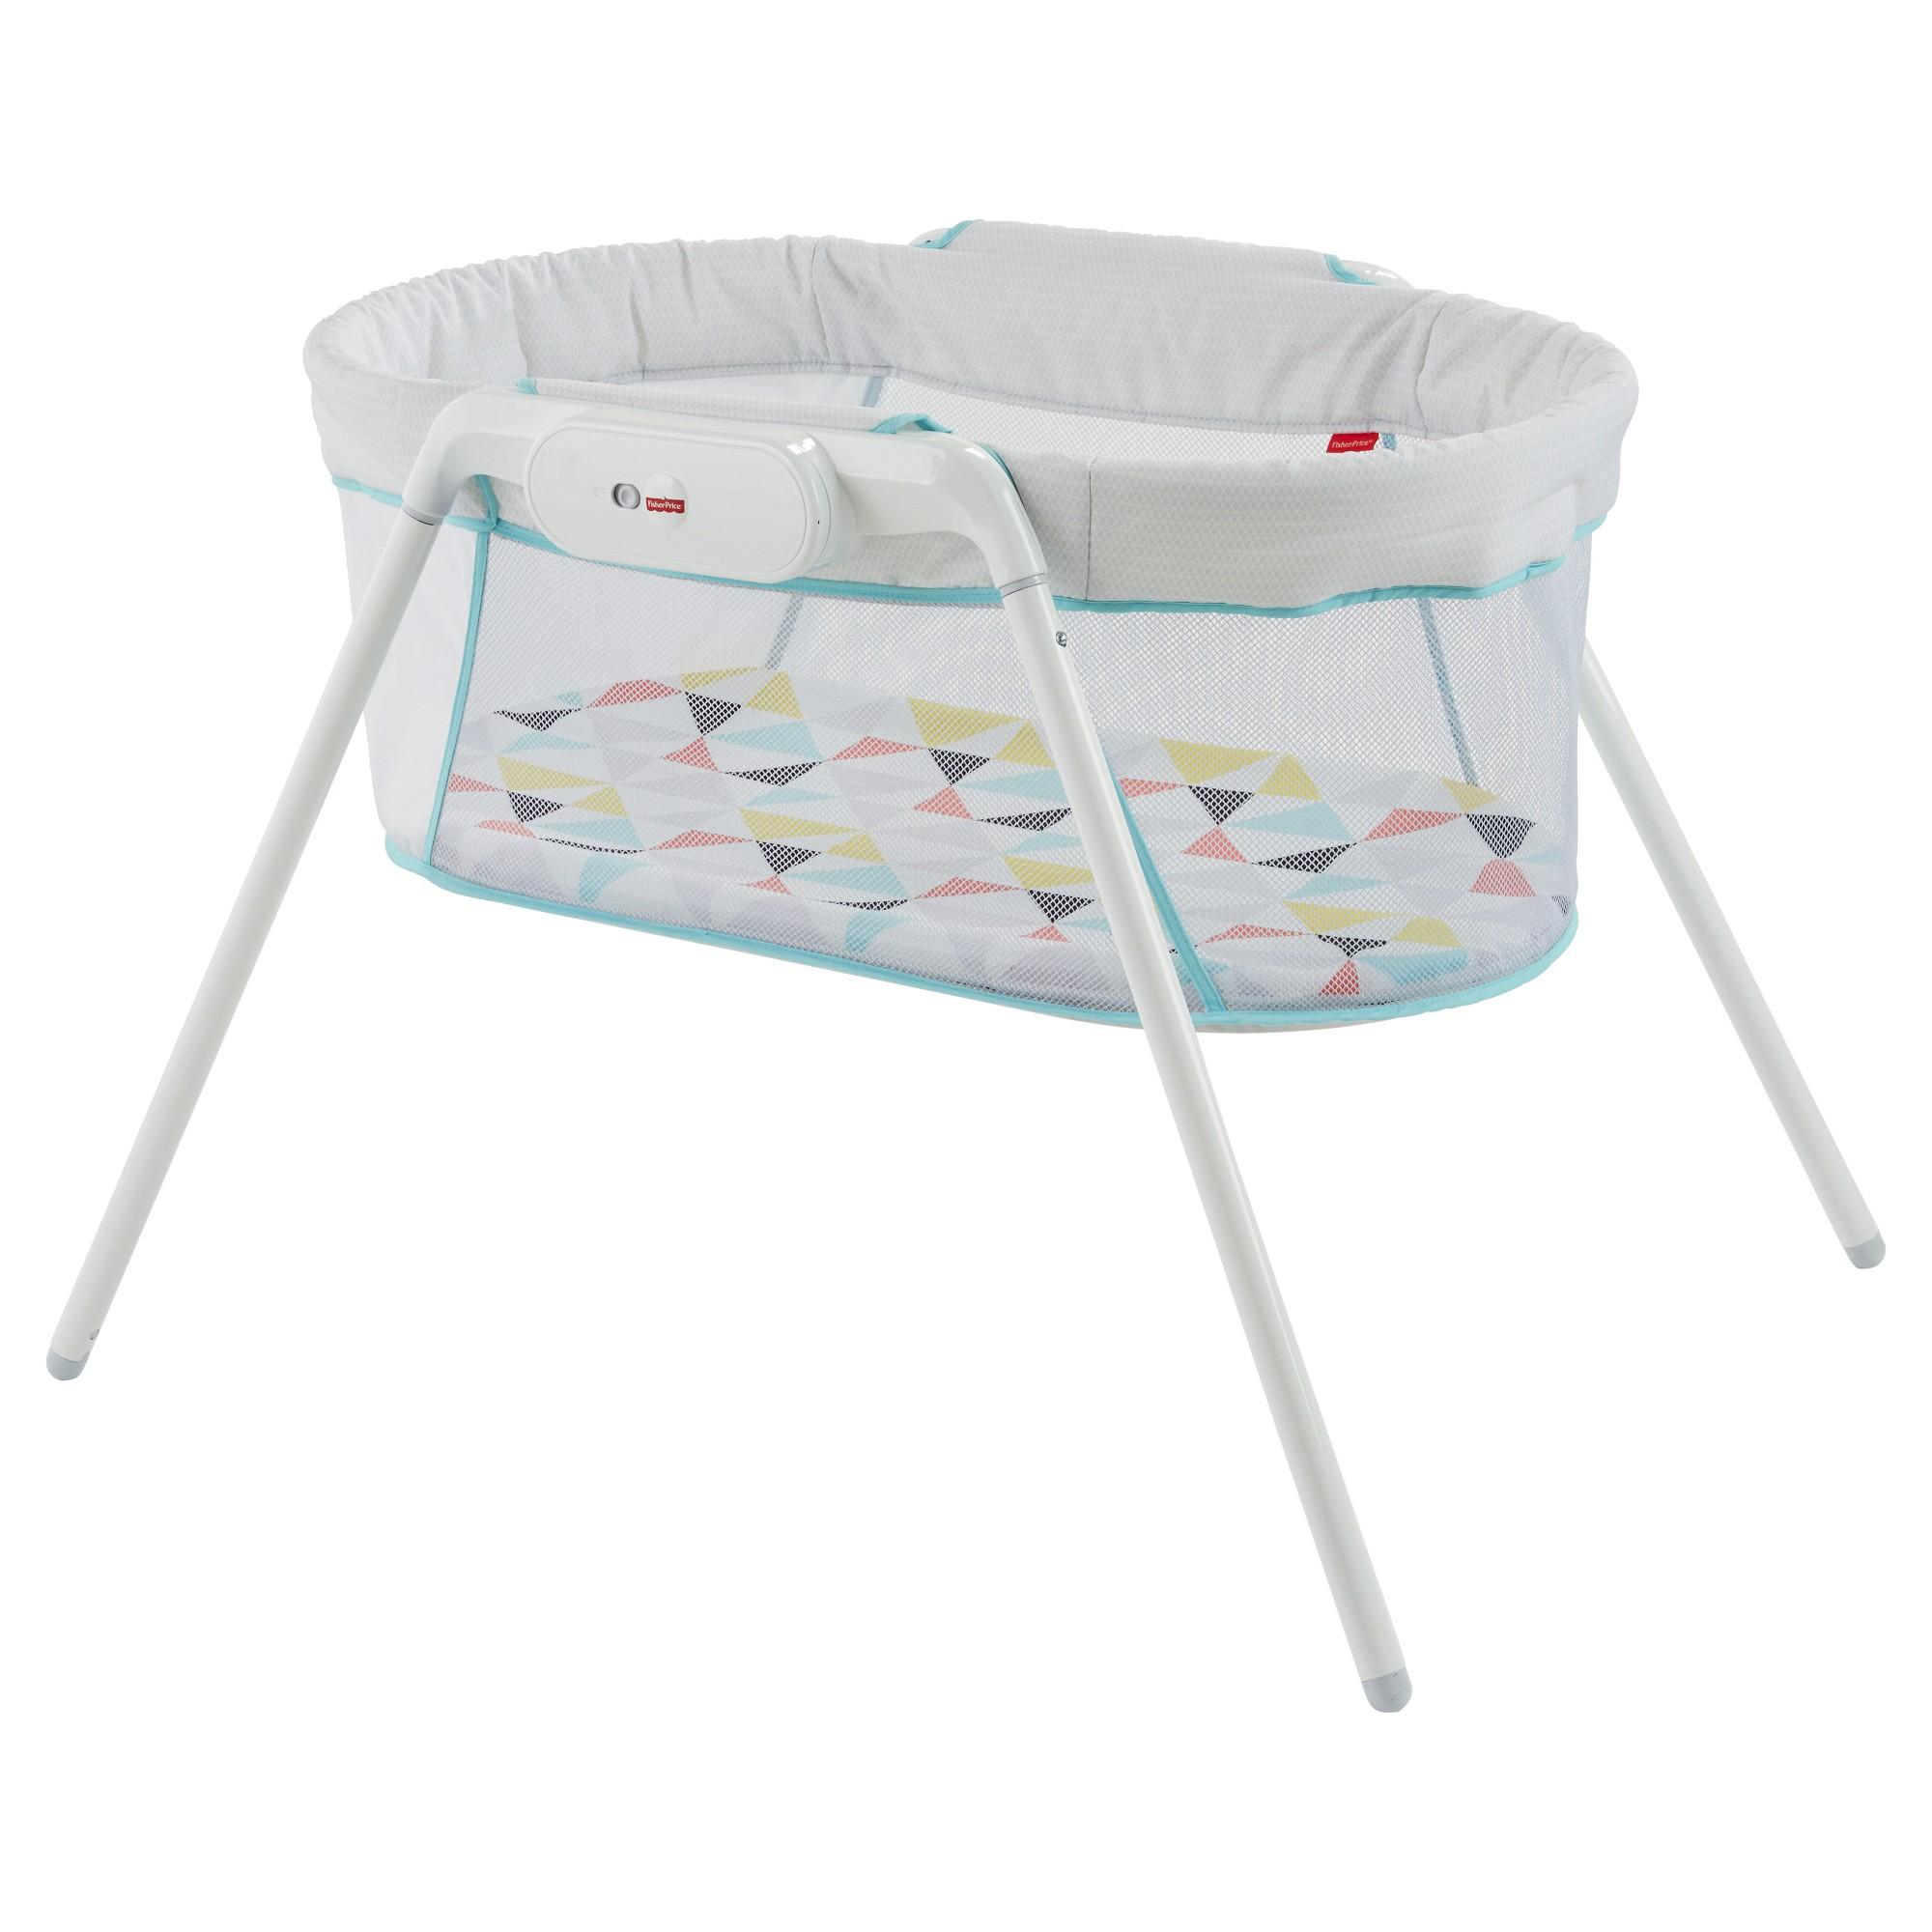 FisherPrice Stow 'n Go Portable baby